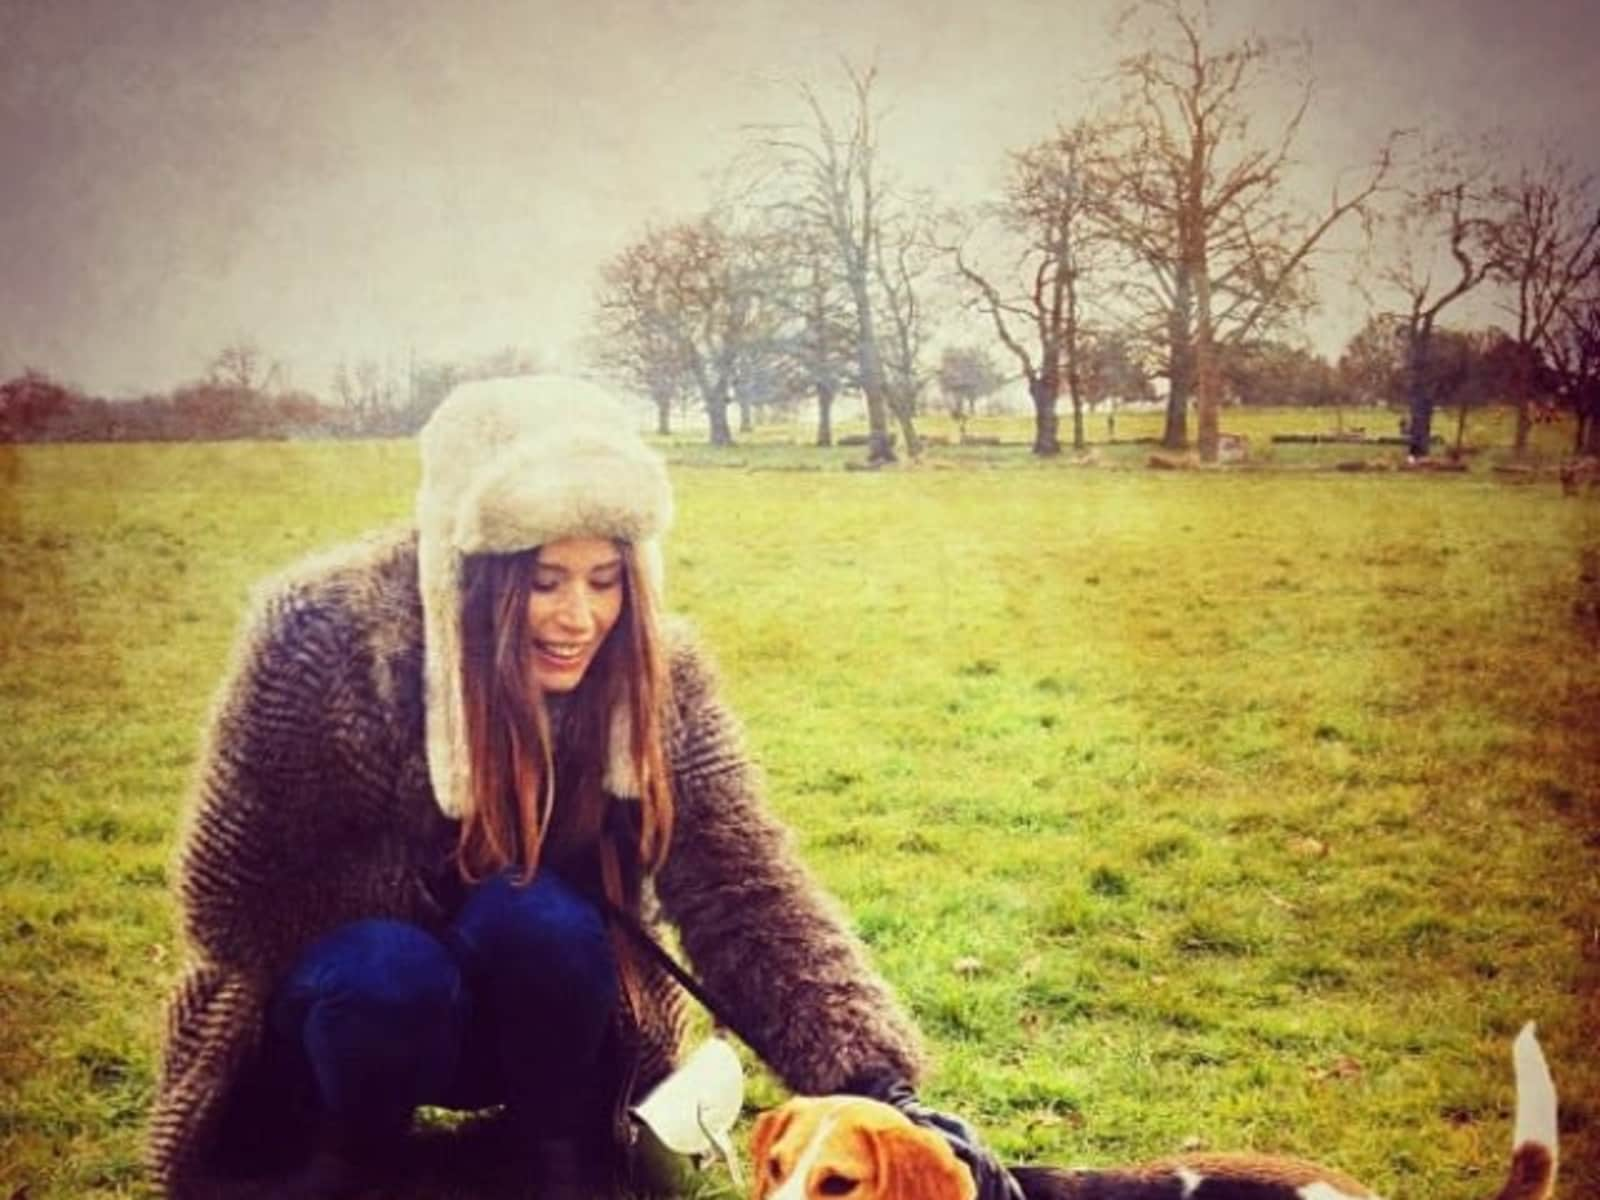 Lisa from London, United Kingdom